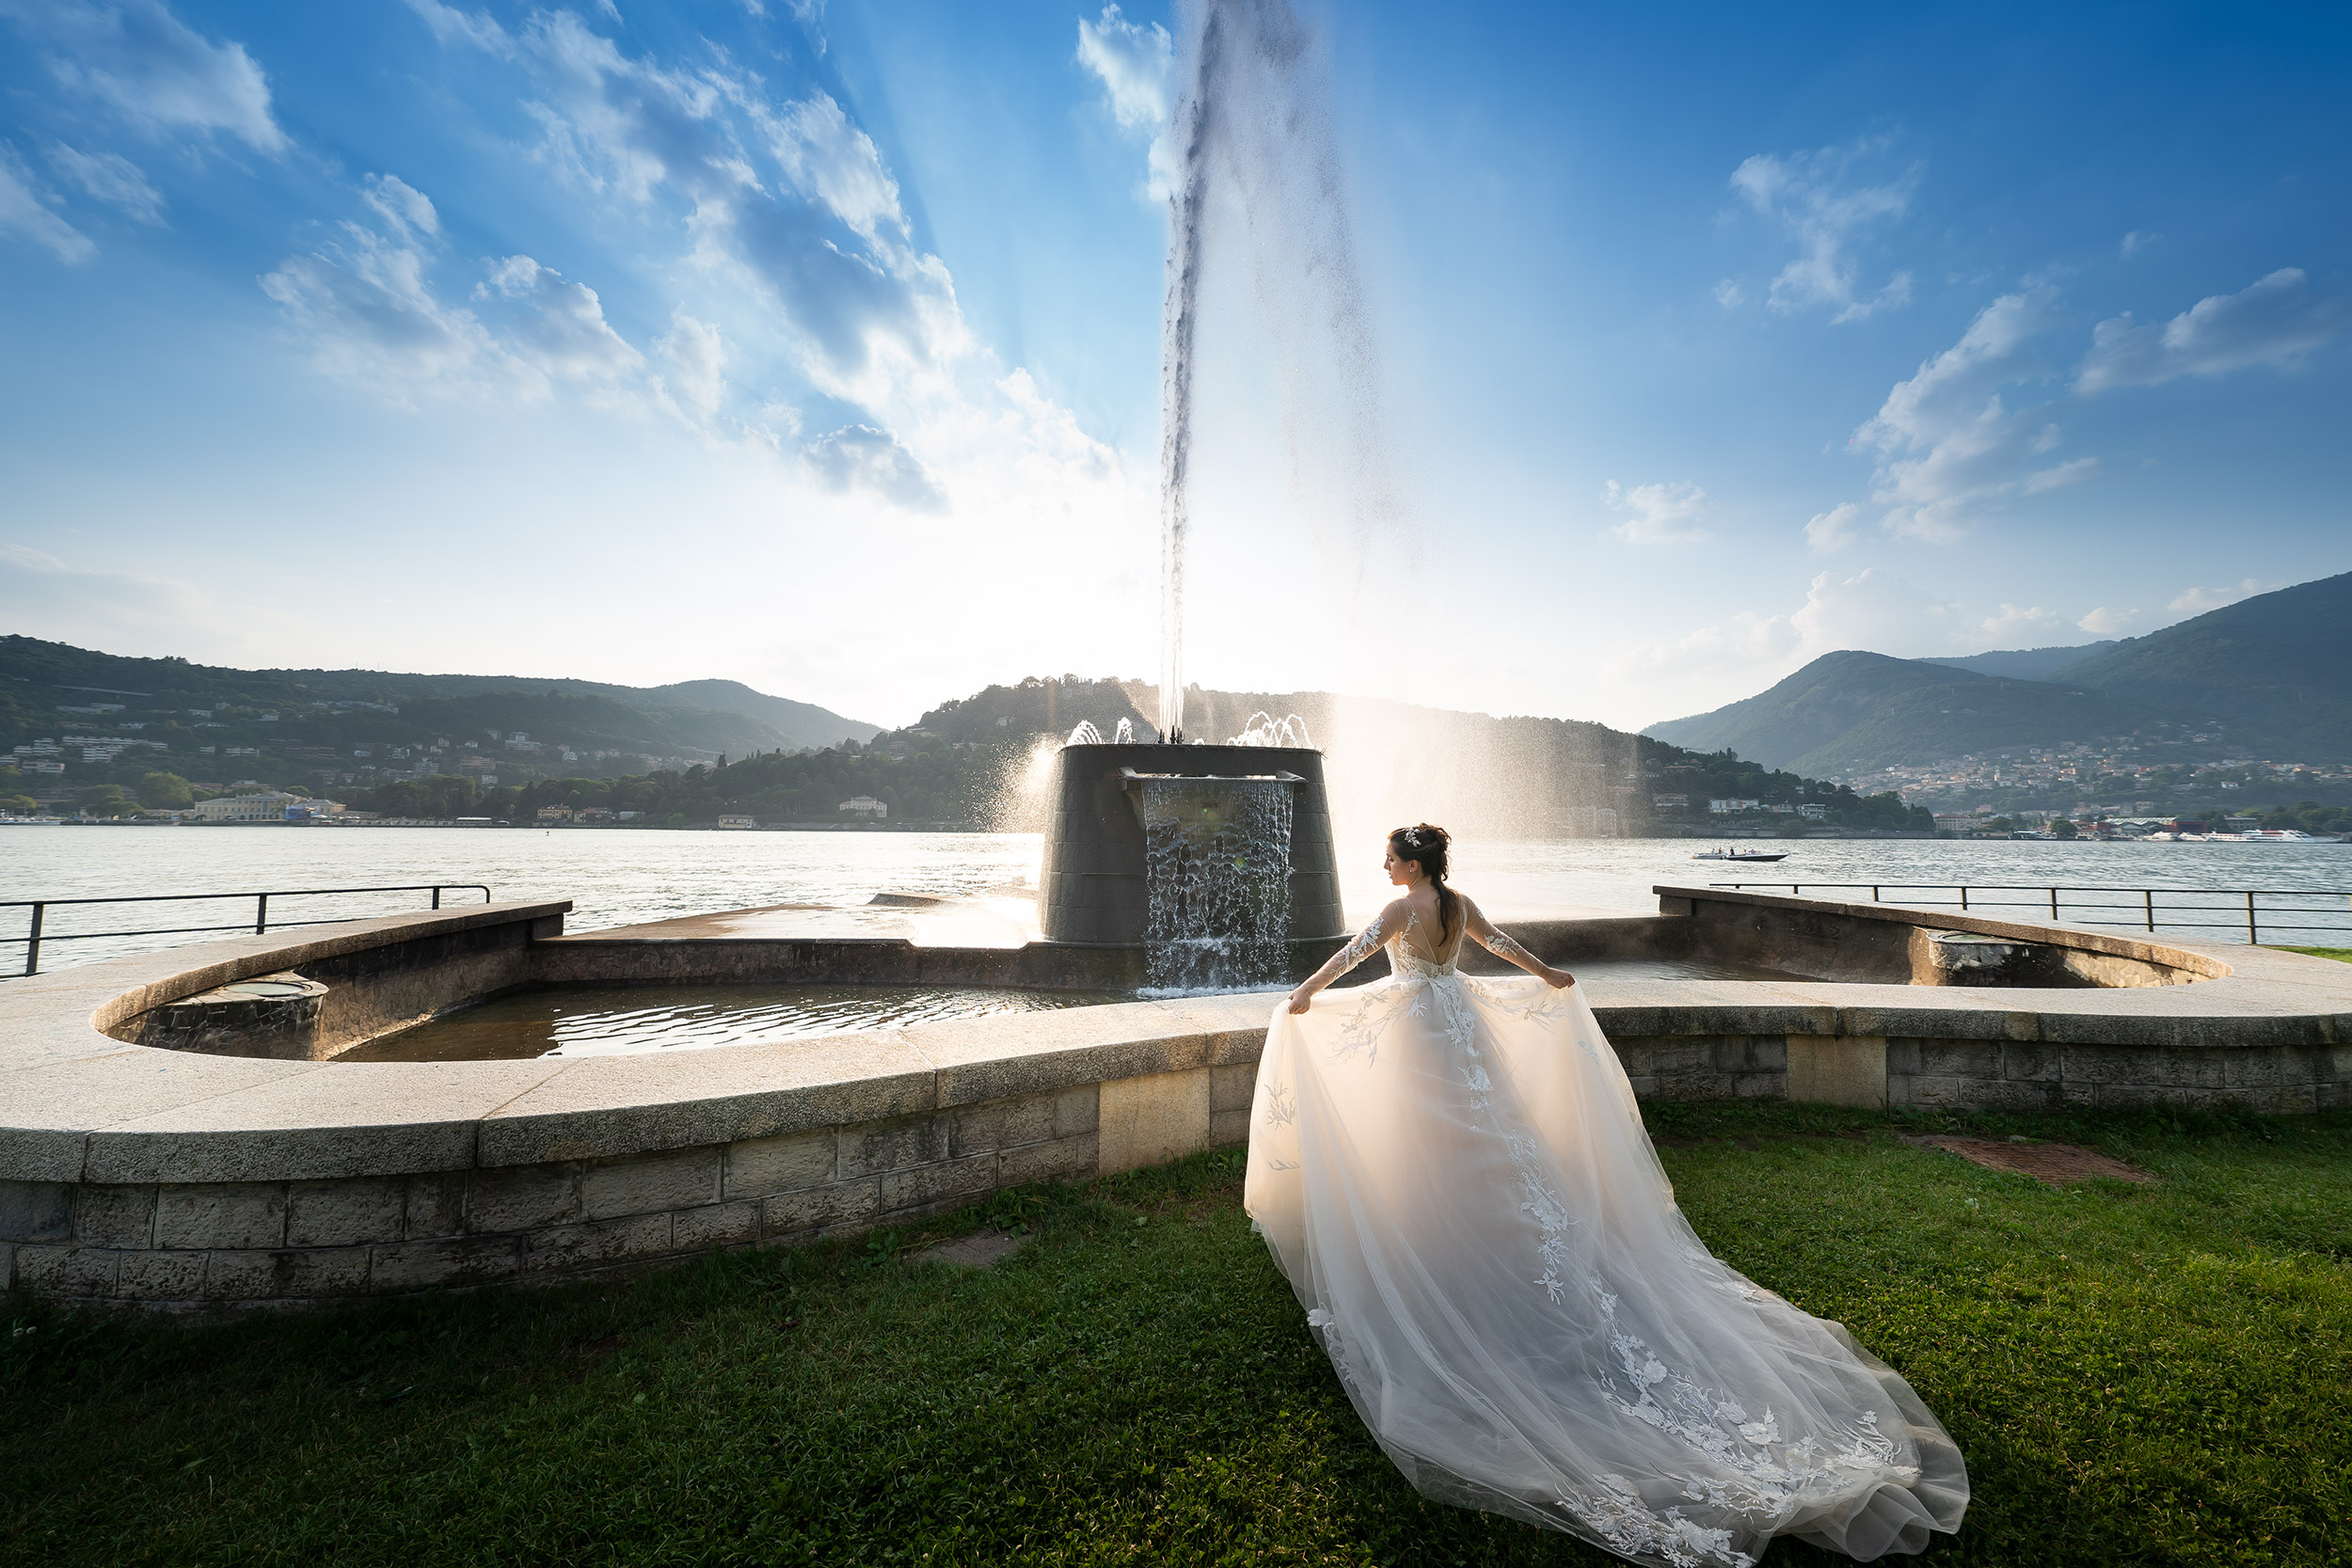 045 fotografo matrimonio reportage wedding sposi ritratti lago fontana villa geno como 4